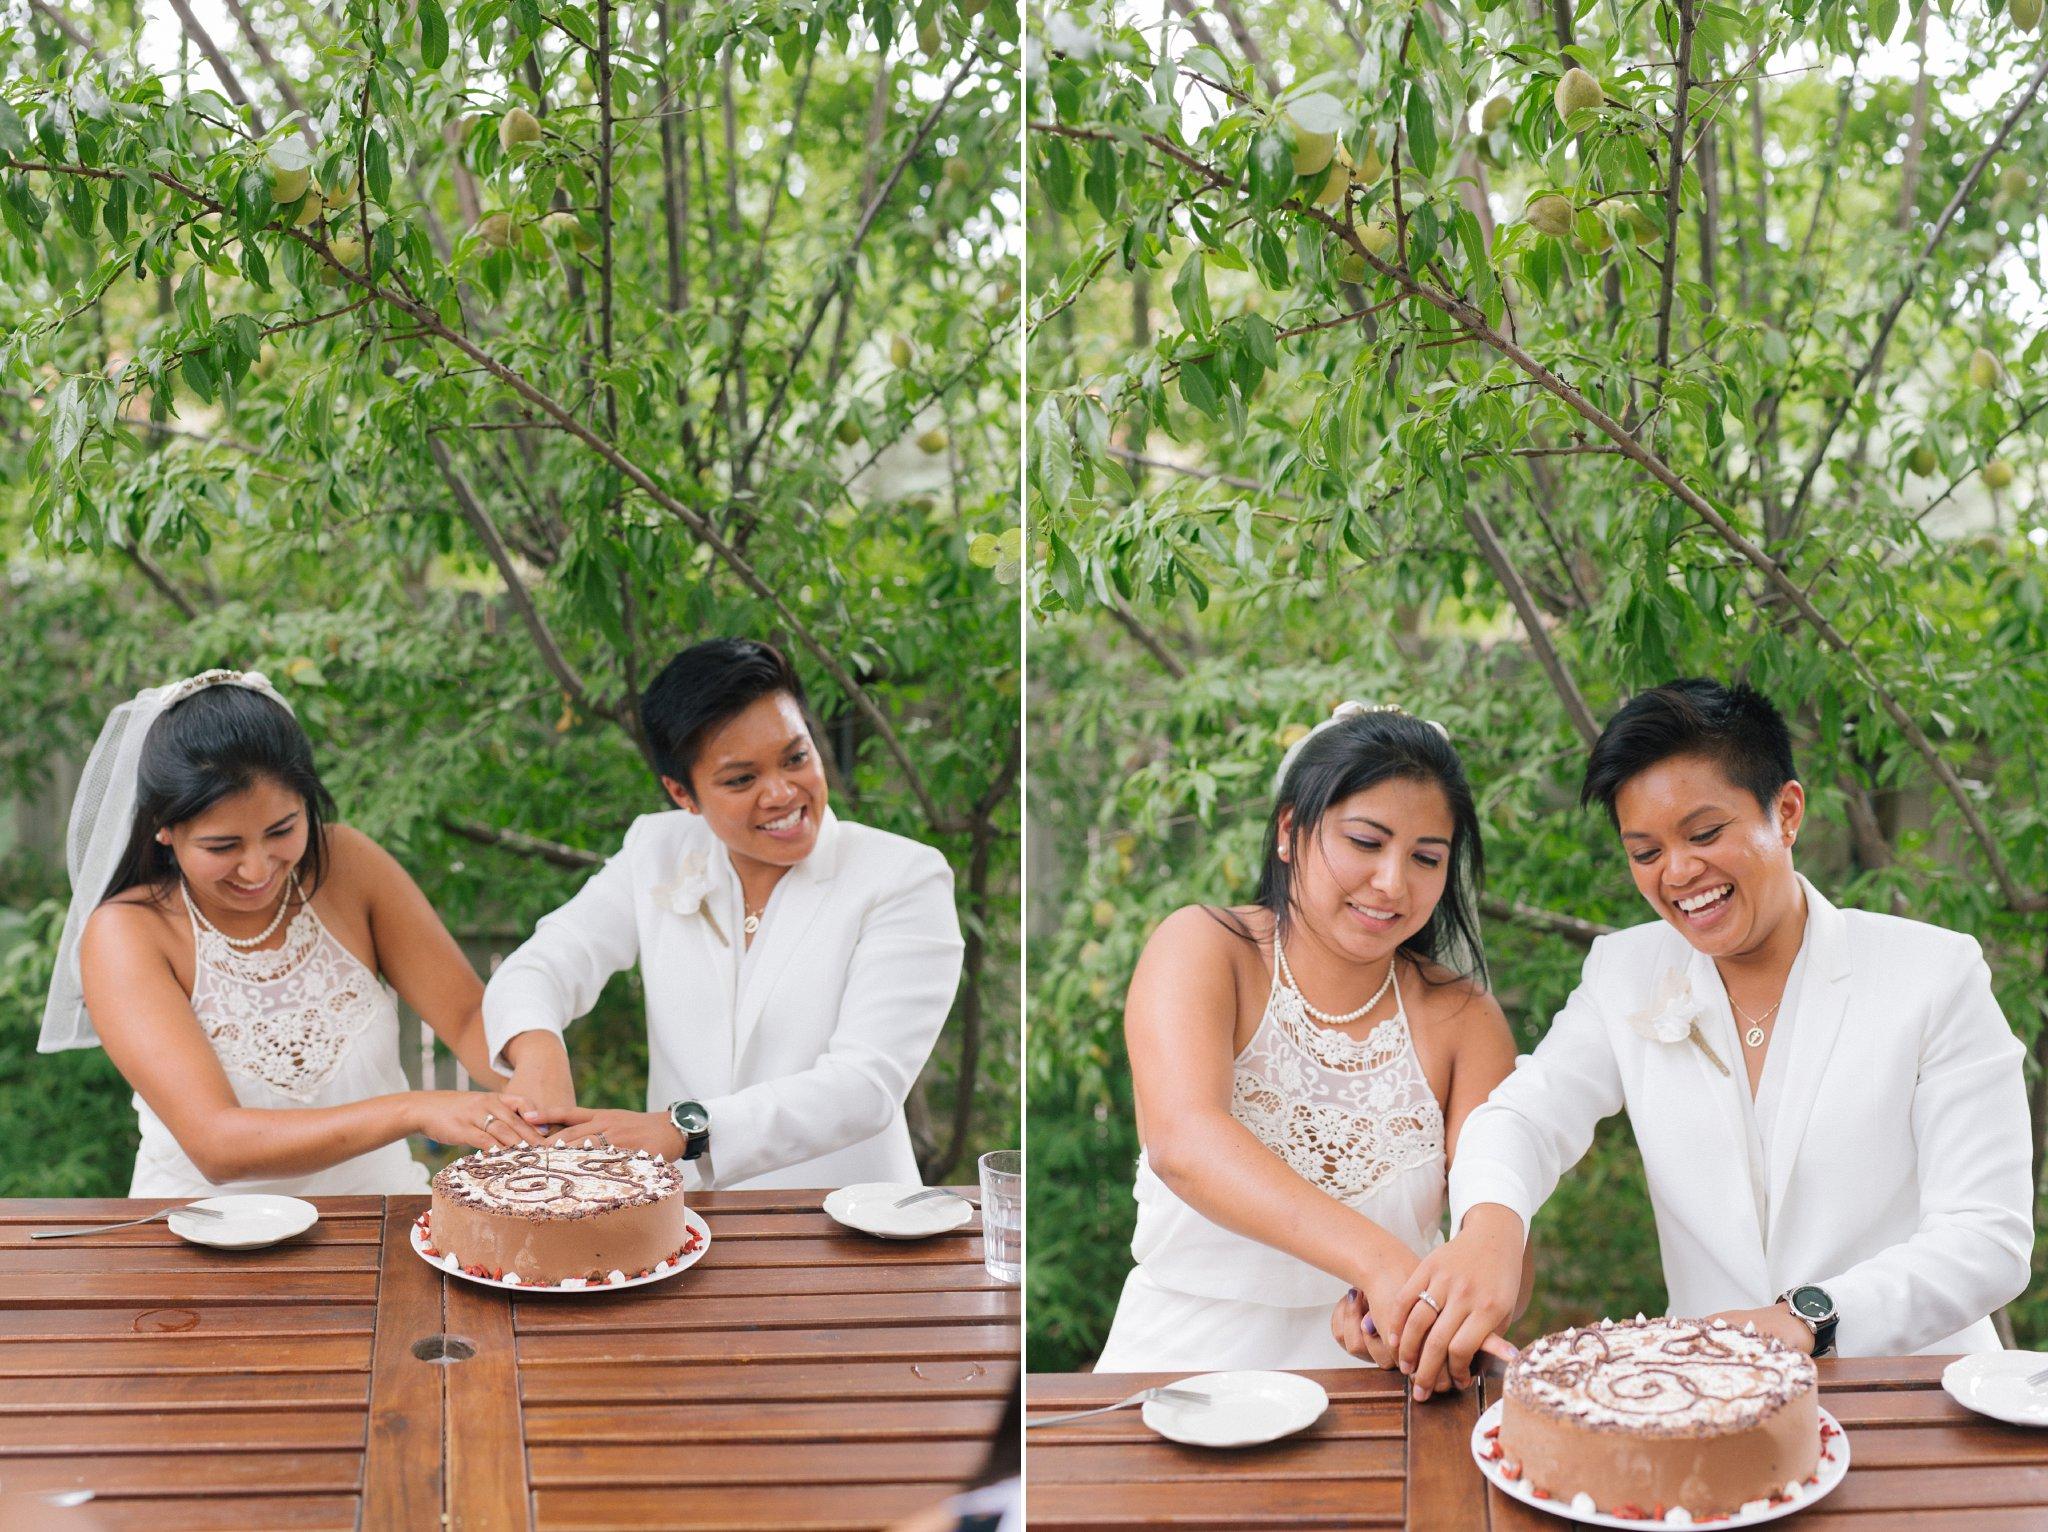 candid natural authentic photography LGBT elopement reception at Chocola Tree restuarant Sedona